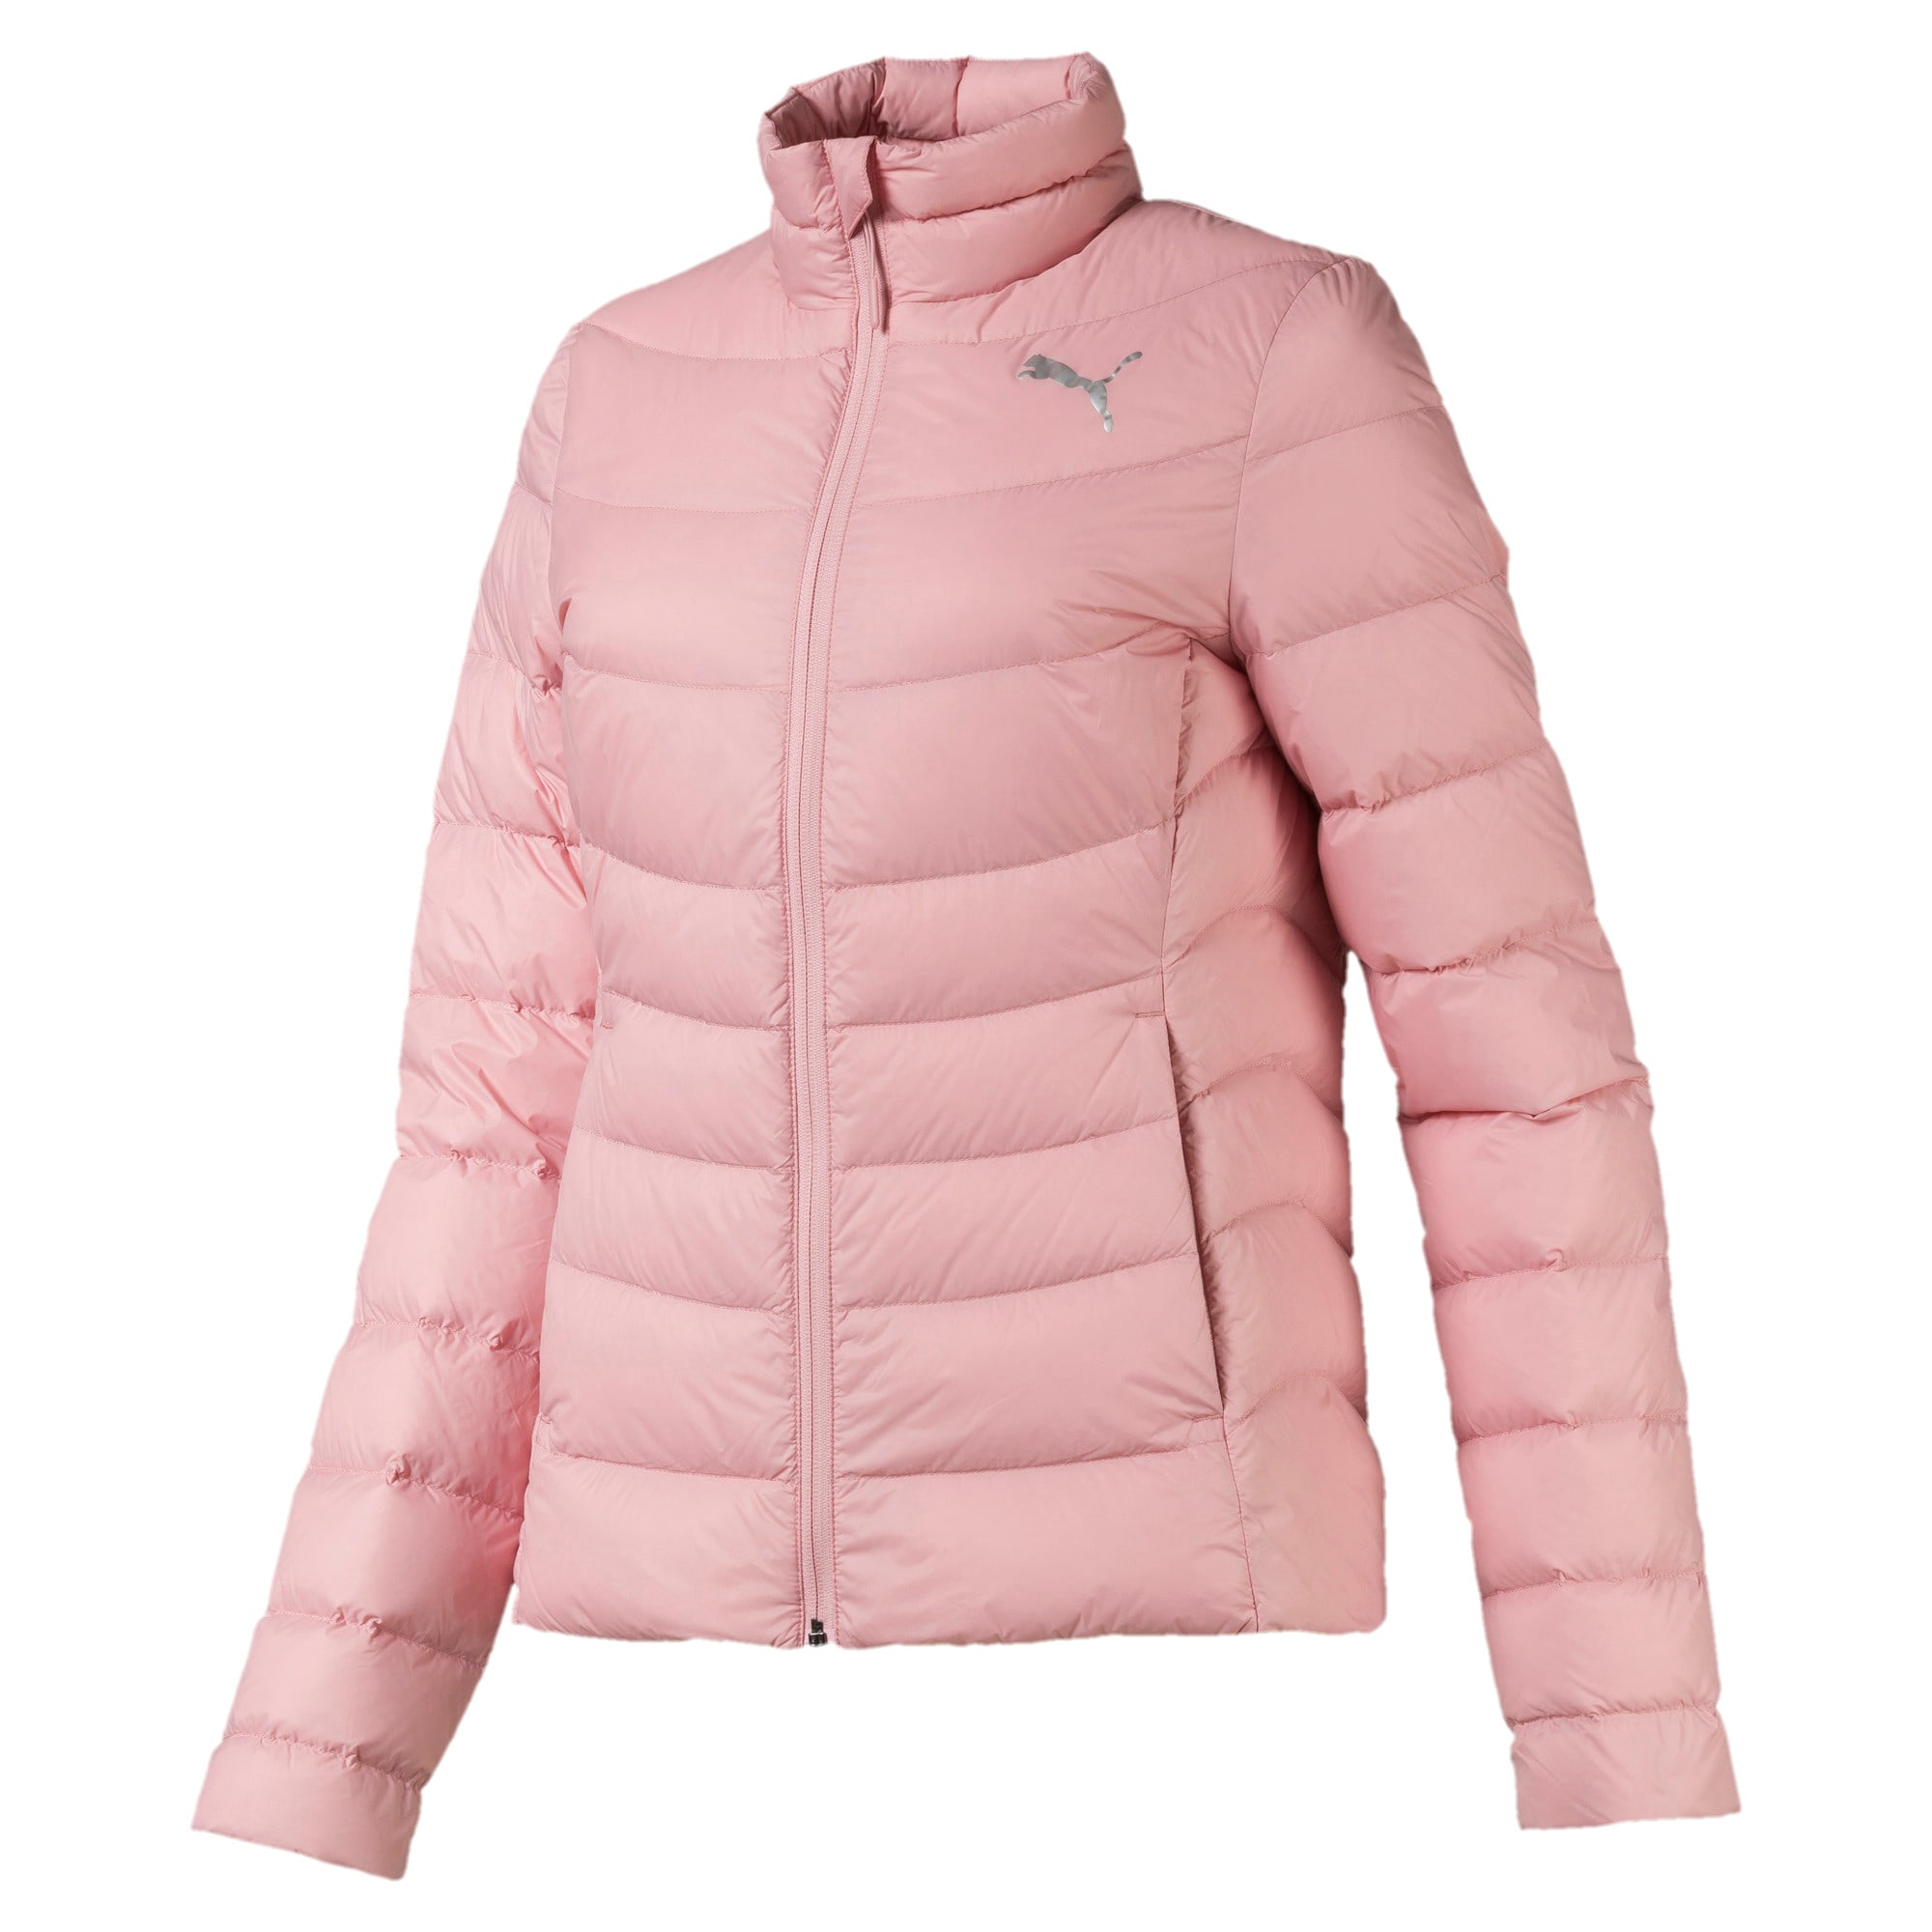 Thumbnail 4 of PWRWarm packLITE 600 Down Women's Jacket, Bridal Rose, medium